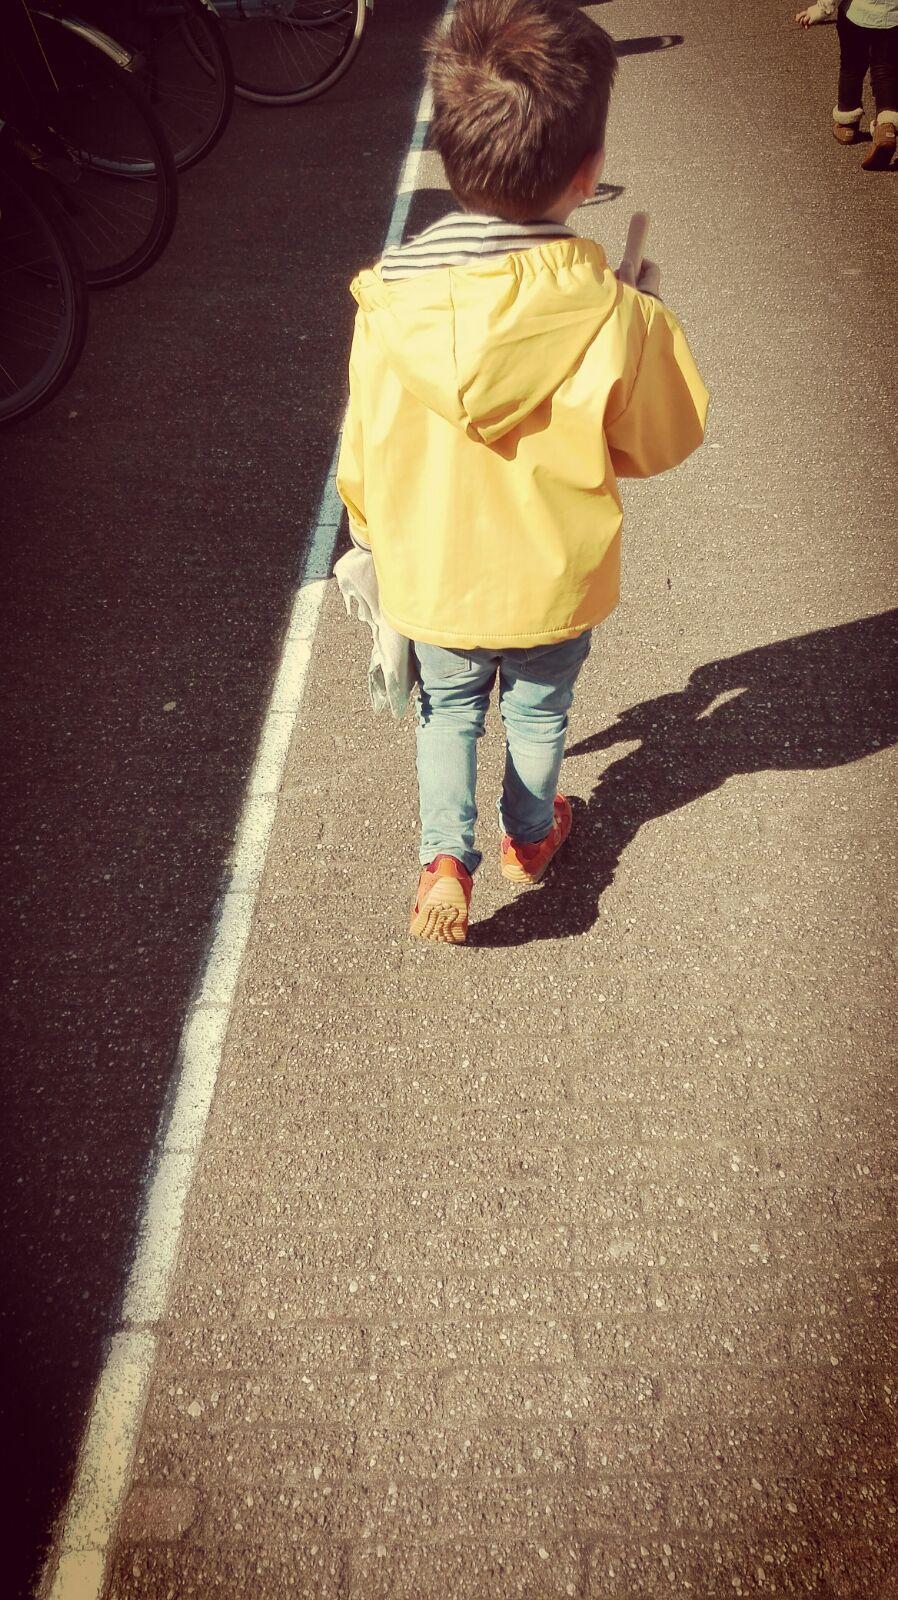 5-16-naturino-schoenen-kleuter-sneakers-oranje-klittenband-goed--mooi-nanny-moeder-amsterdam-blog-review-lopen